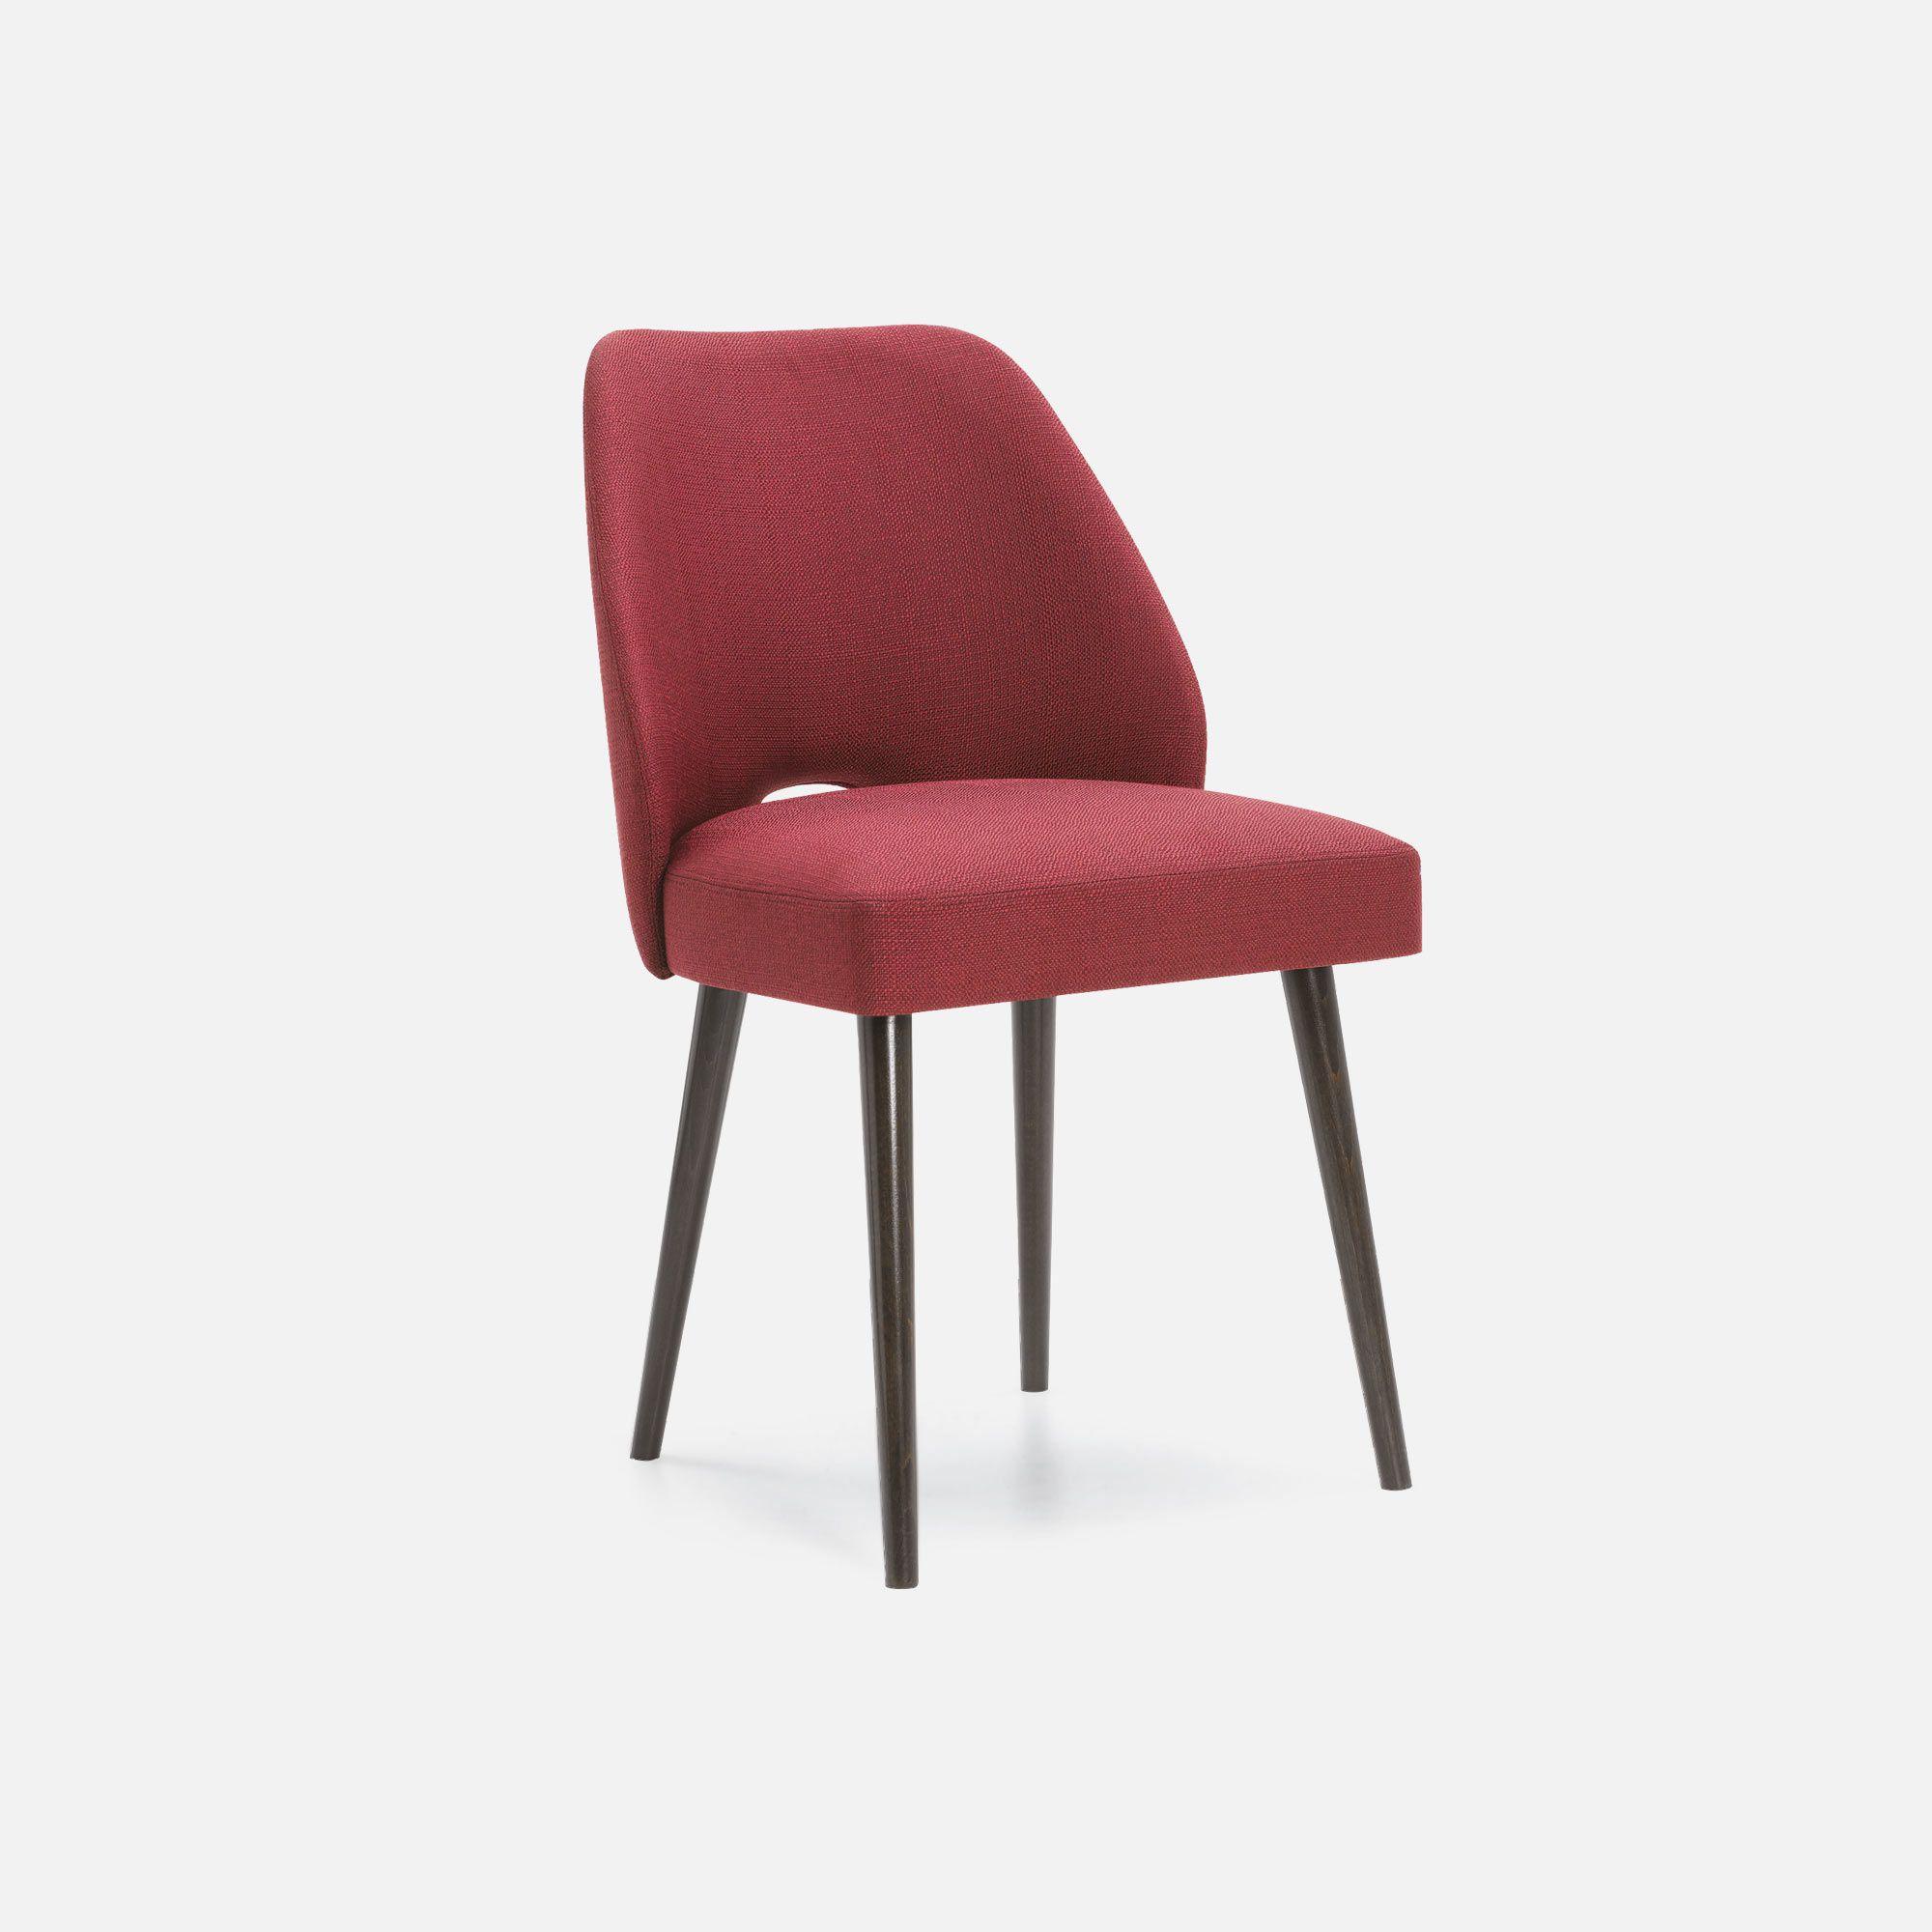 collinet cjaise meuble de salon contemporain. Black Bedroom Furniture Sets. Home Design Ideas